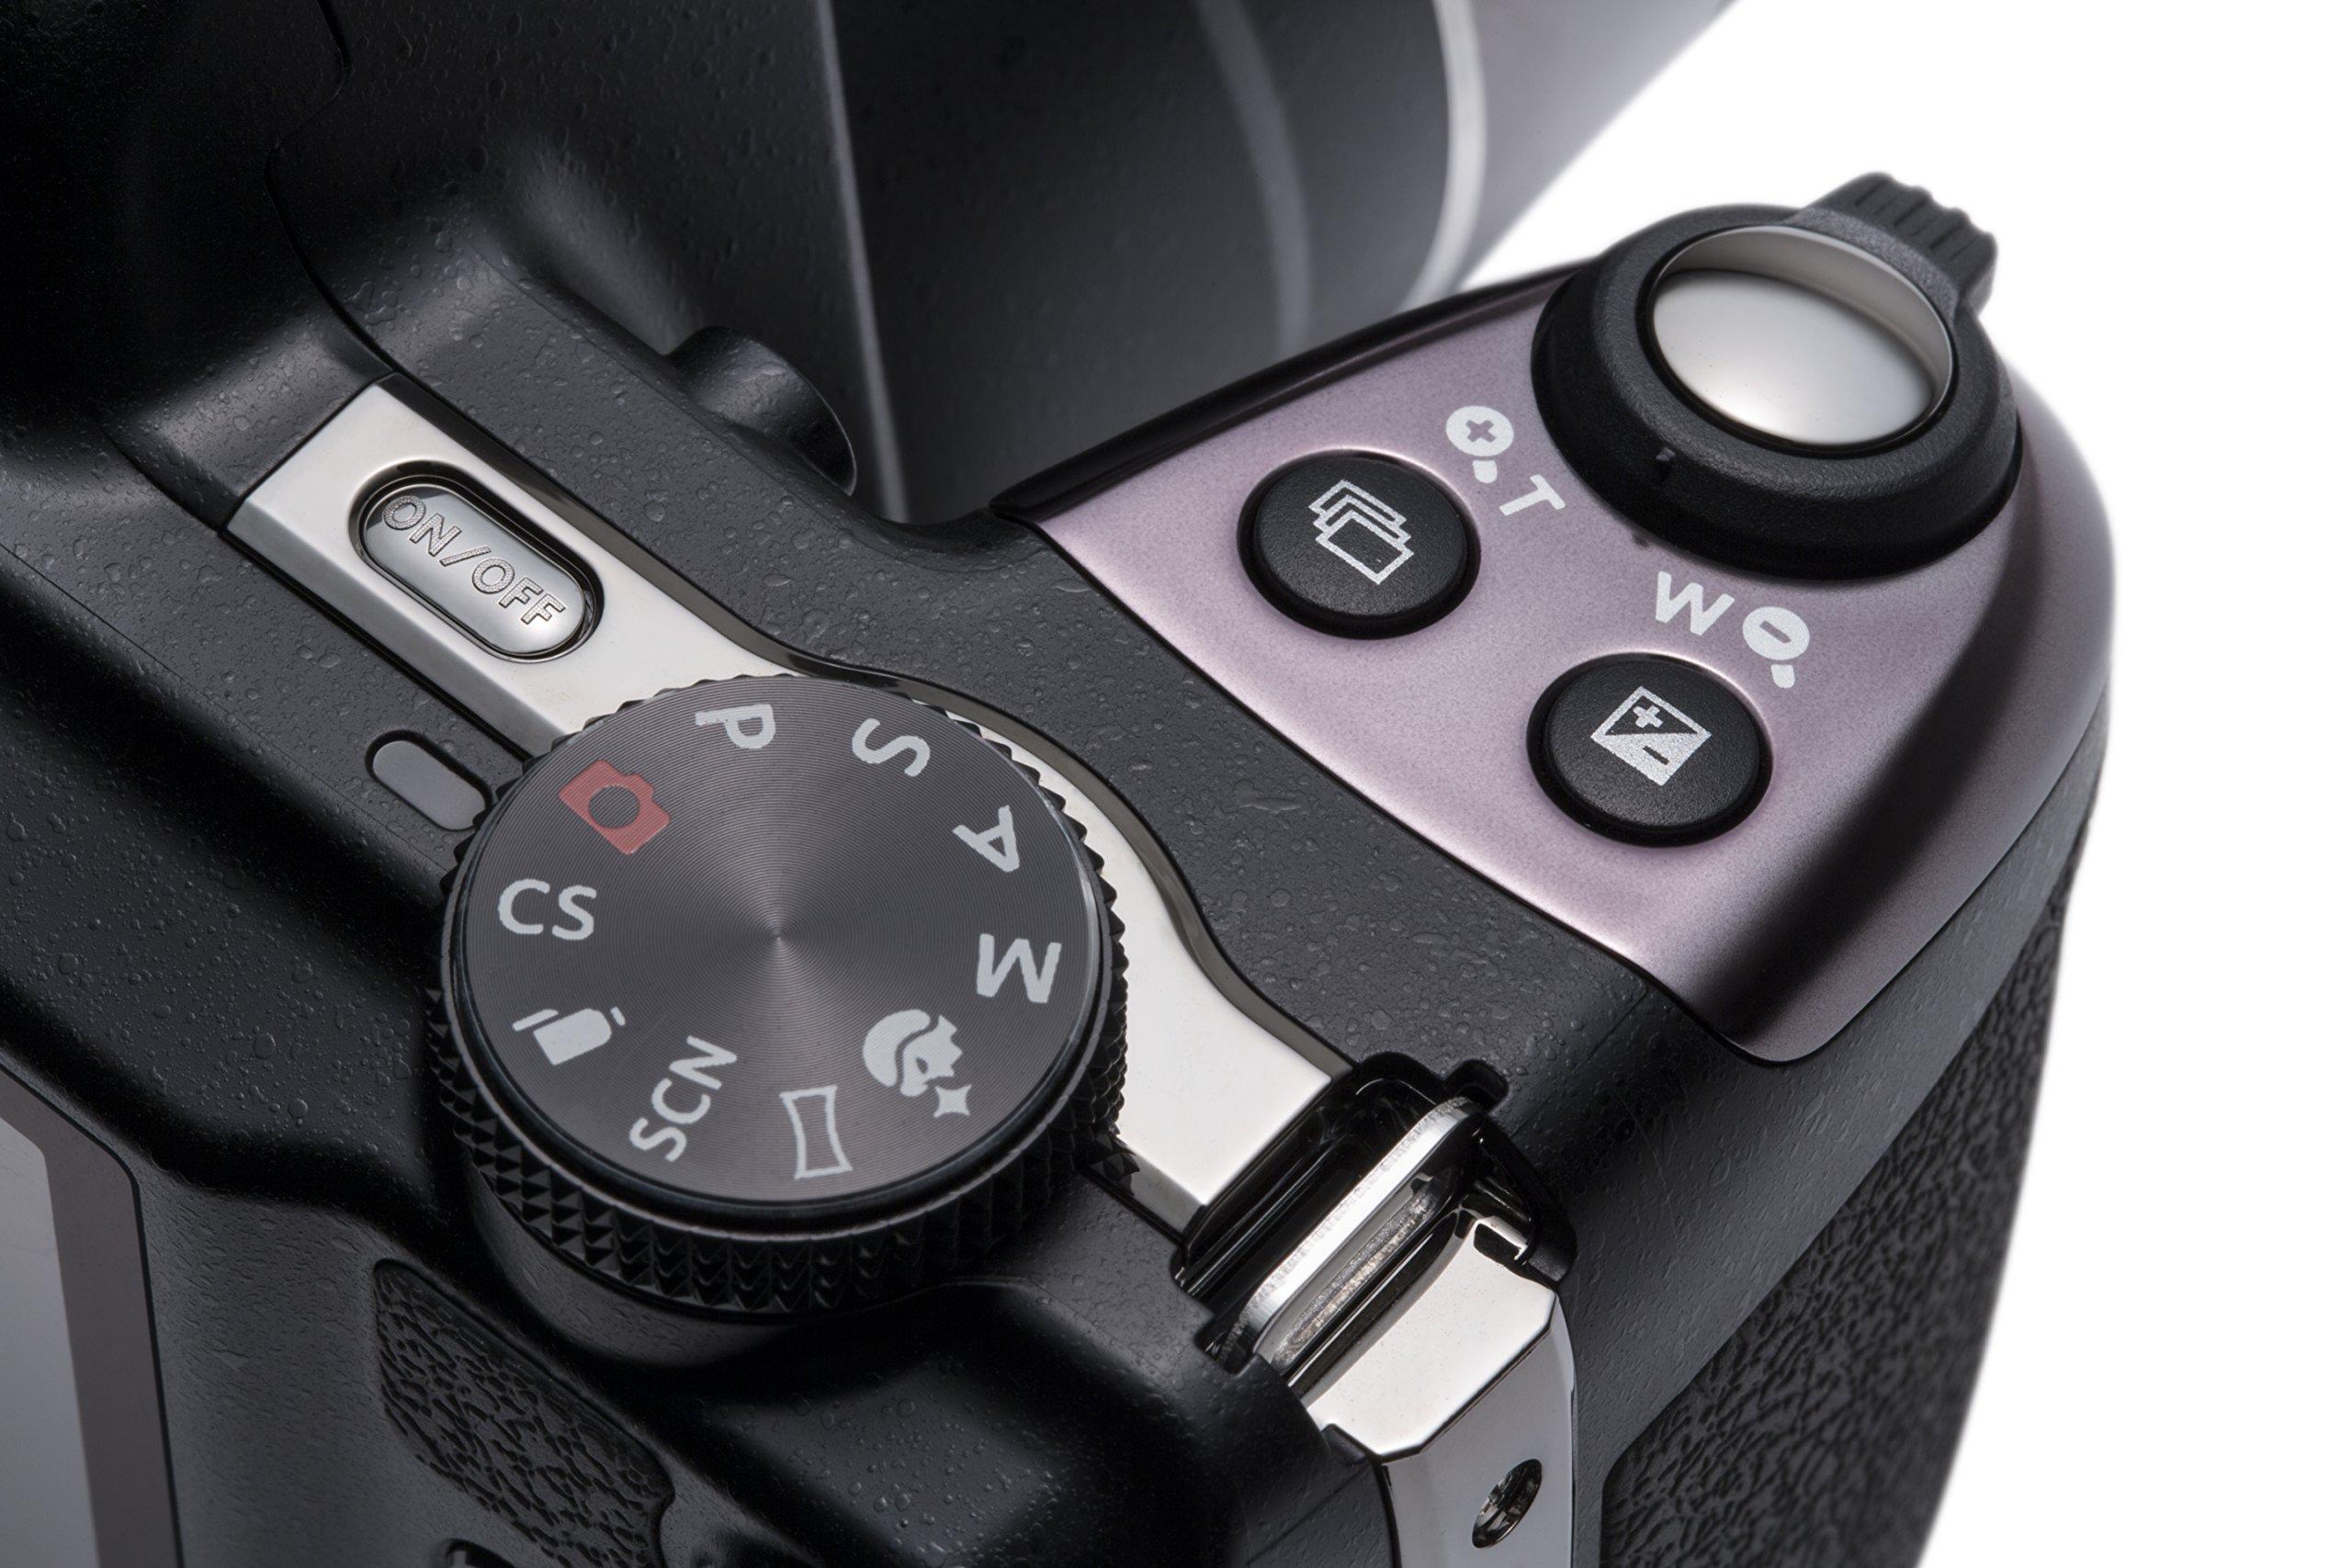 Kodak AZ521, 16MP Camera with 52x Optical Zoom, 3'' LCD Screen, 1080p Video Recording - Black